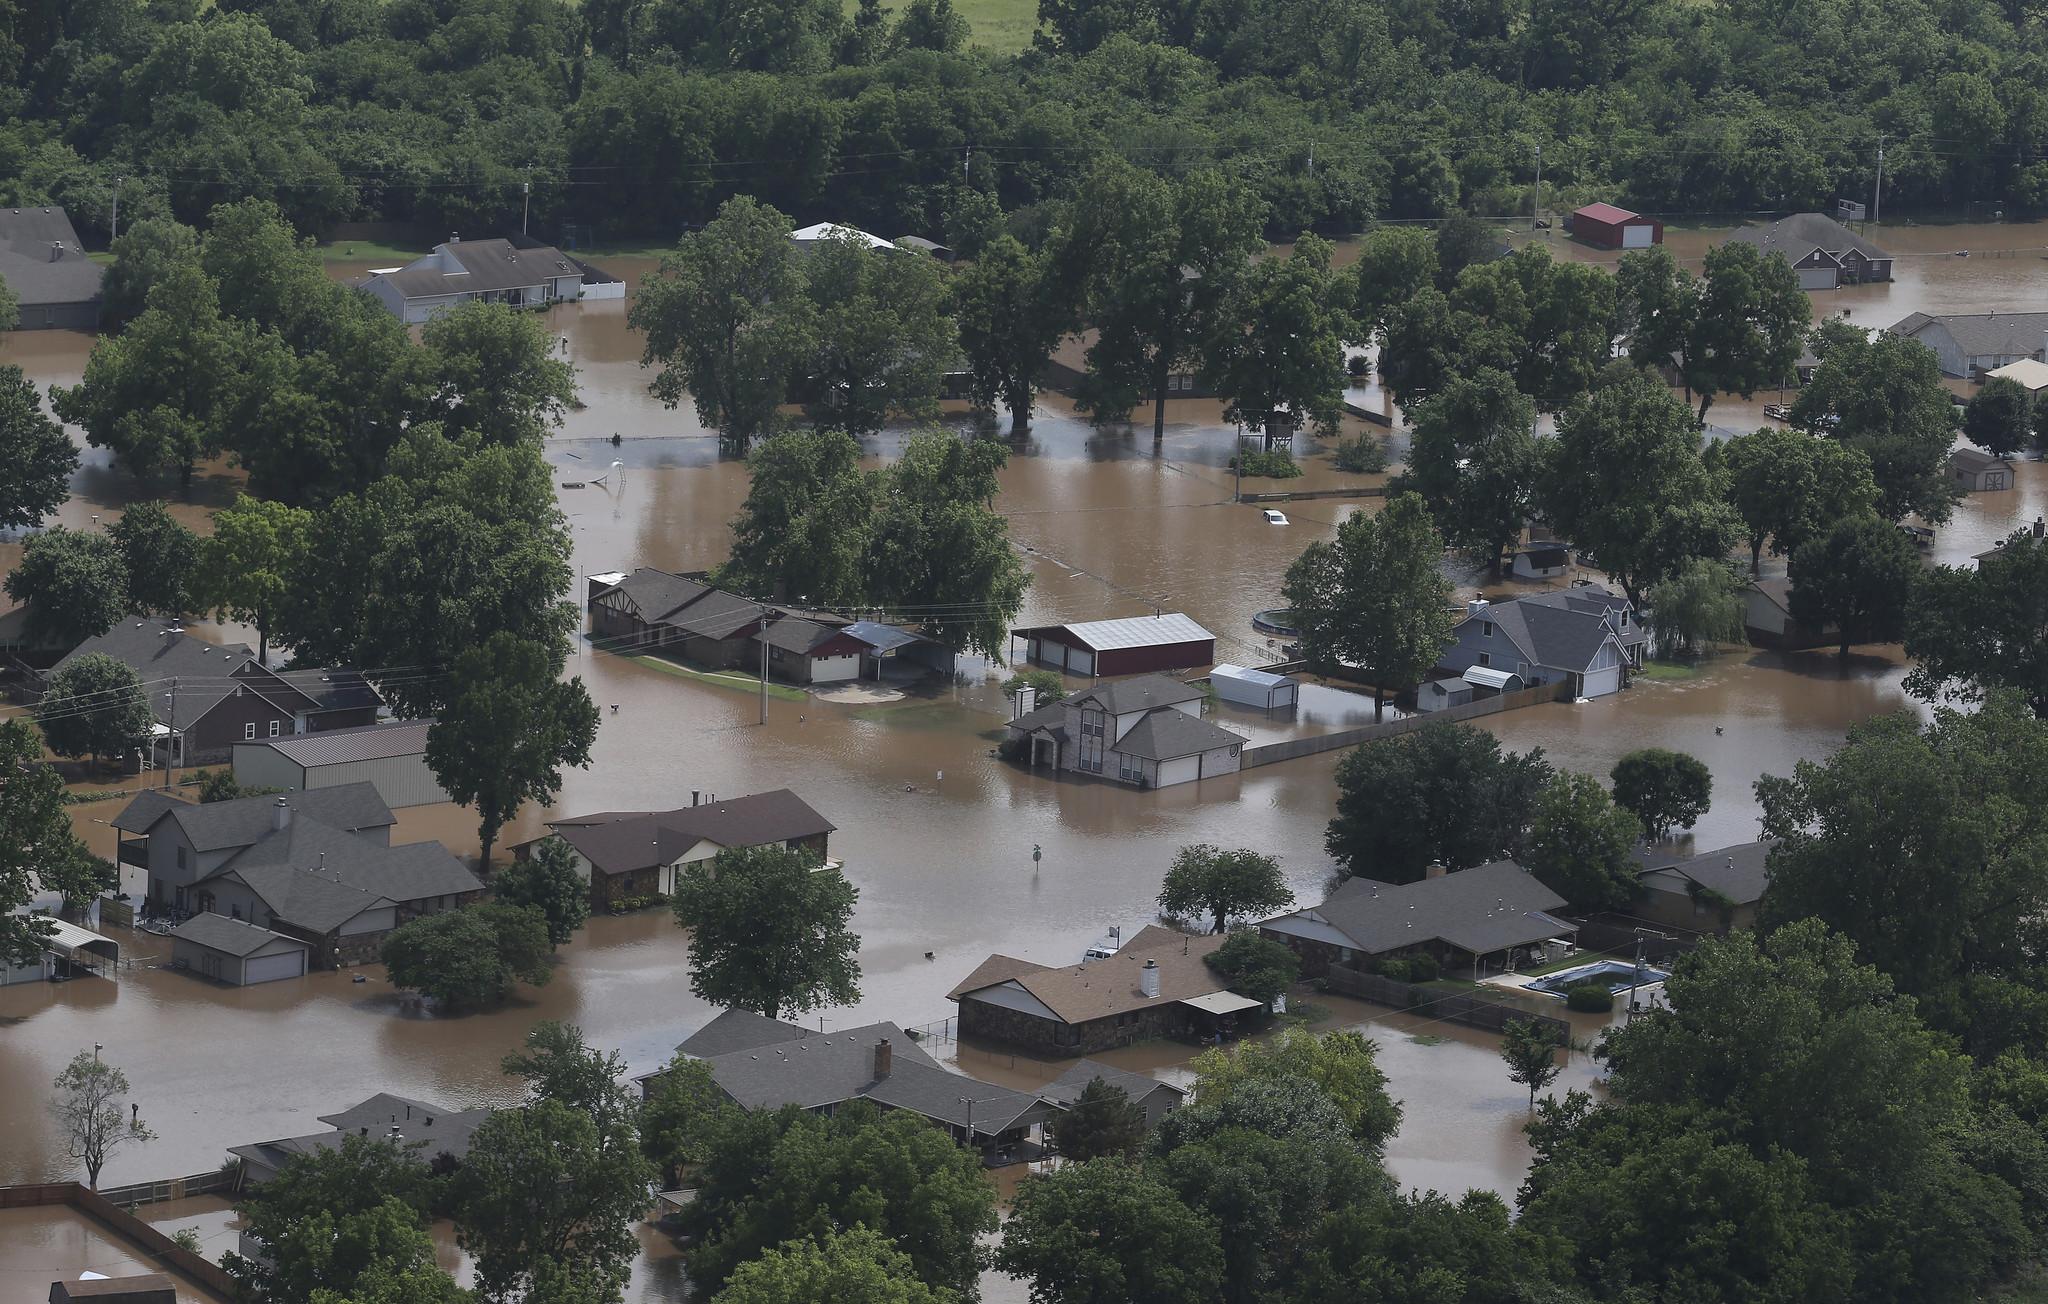 Bodies found in submerged Missouri vehicle bring central U.S. storm death toll to 9